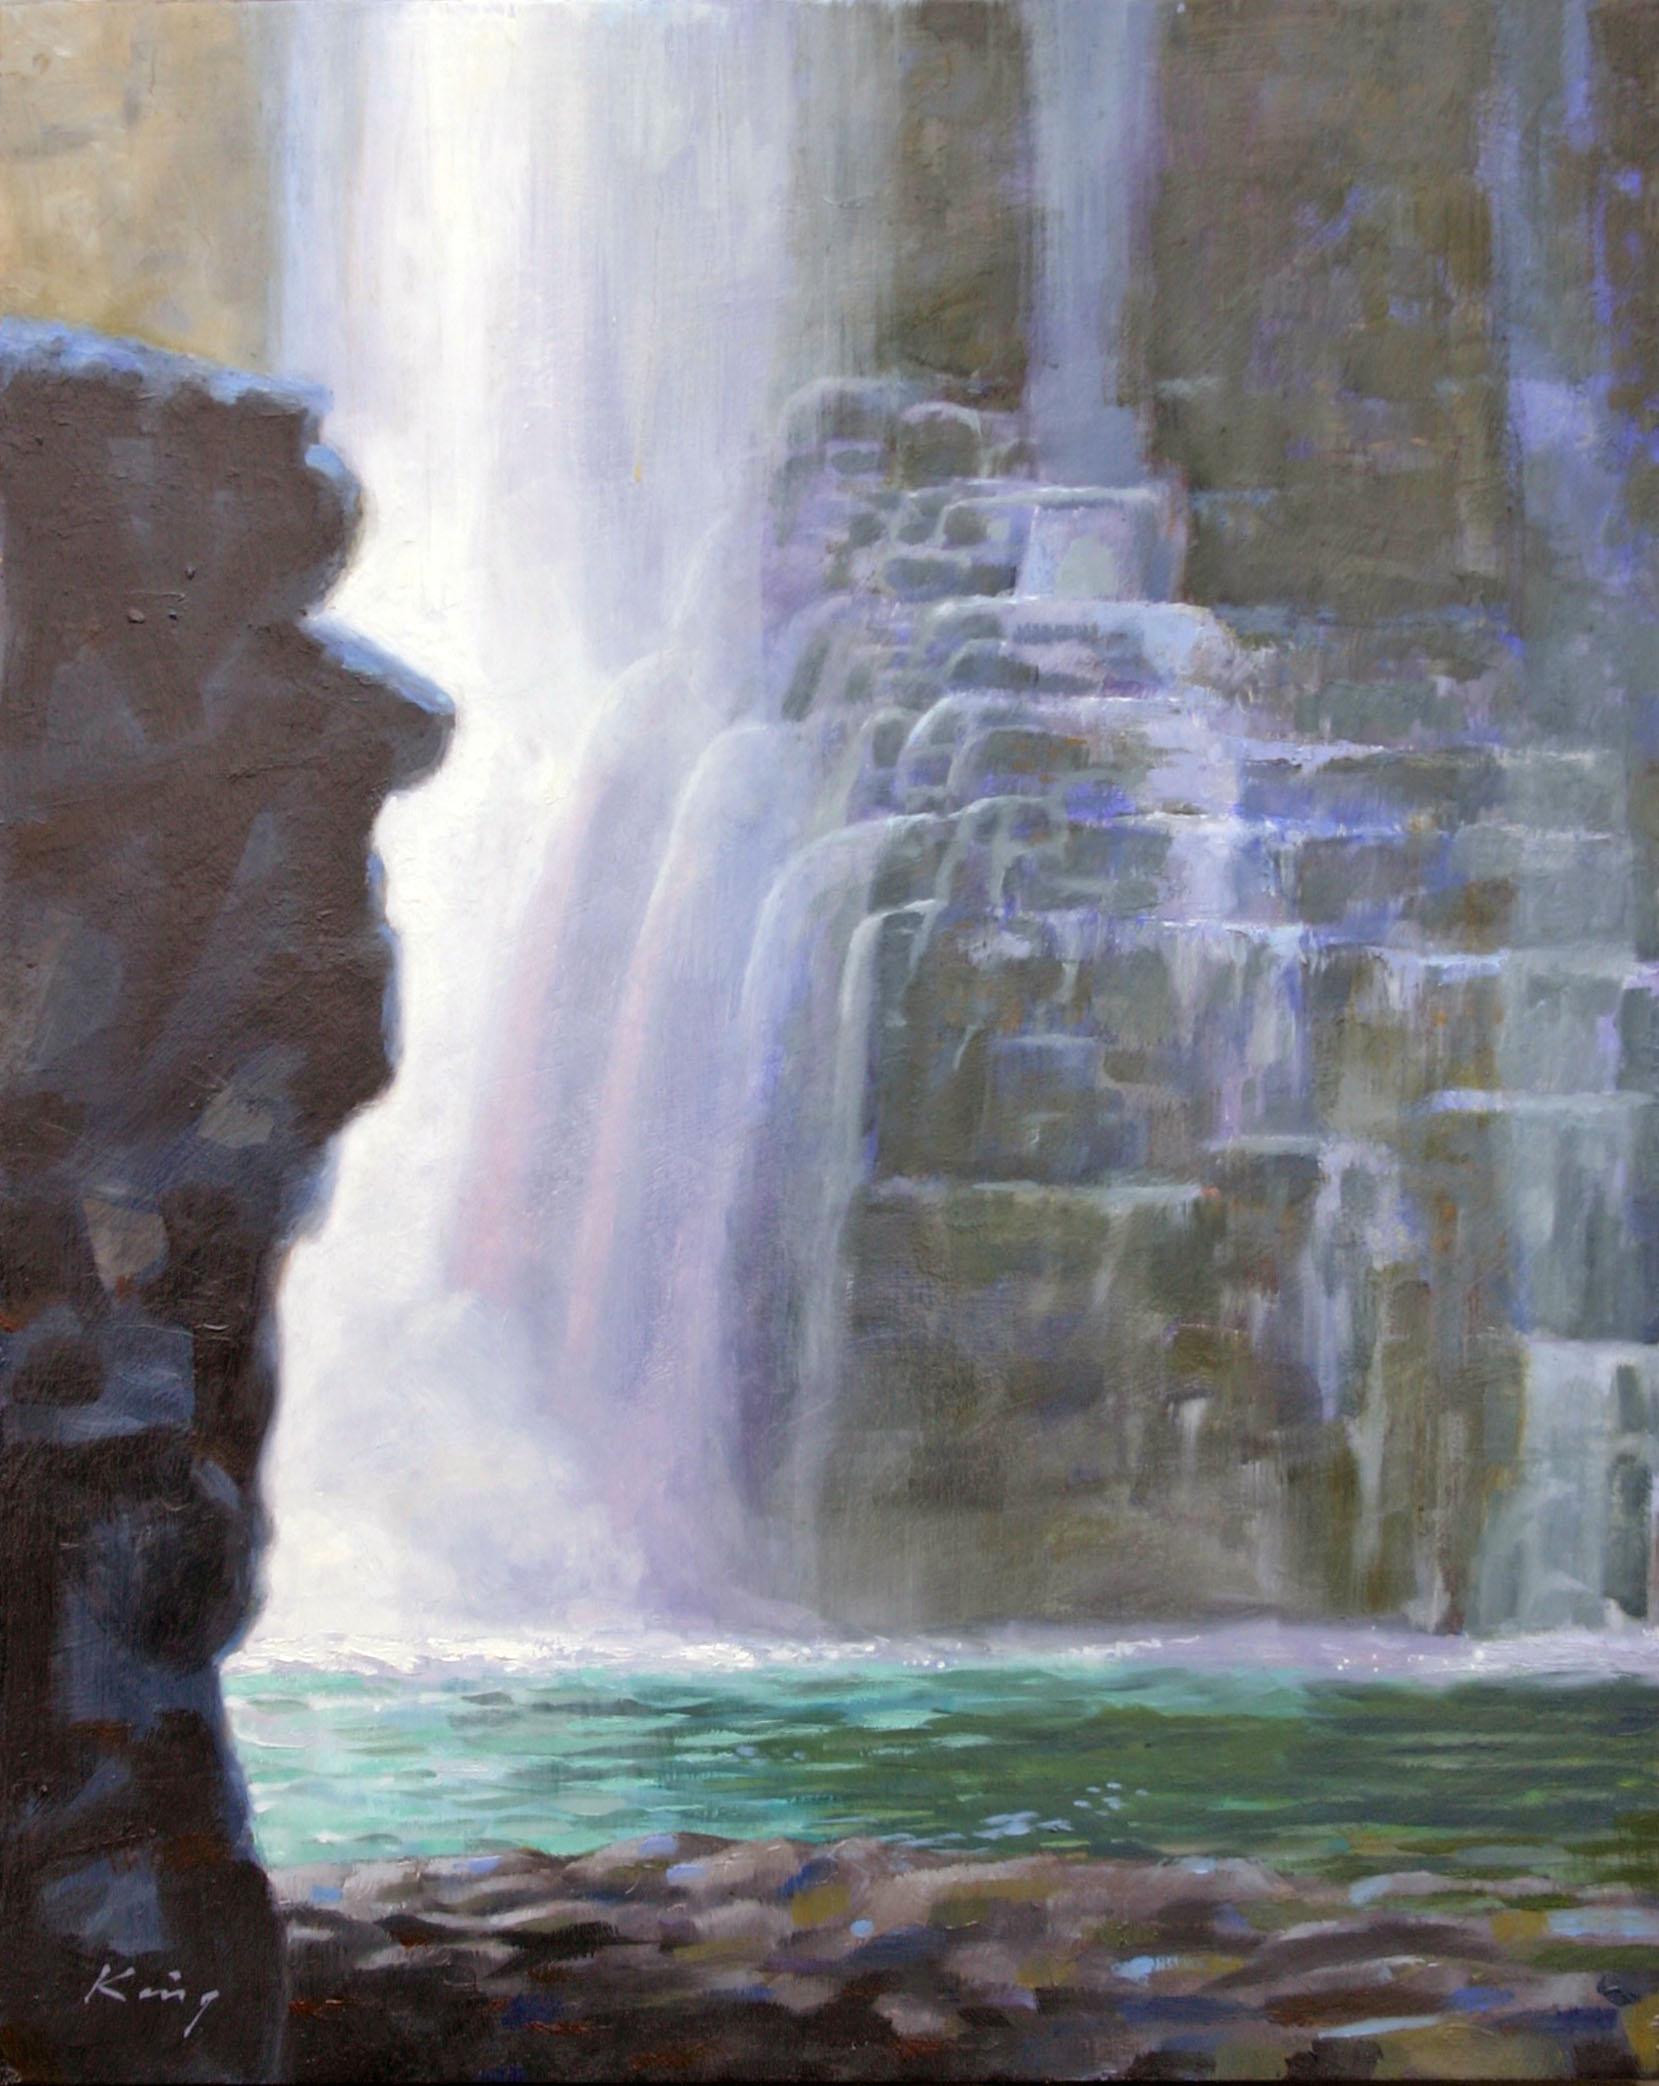 "Johnston Canyon, Banff - 20"" x 16"" - Oil on panel"